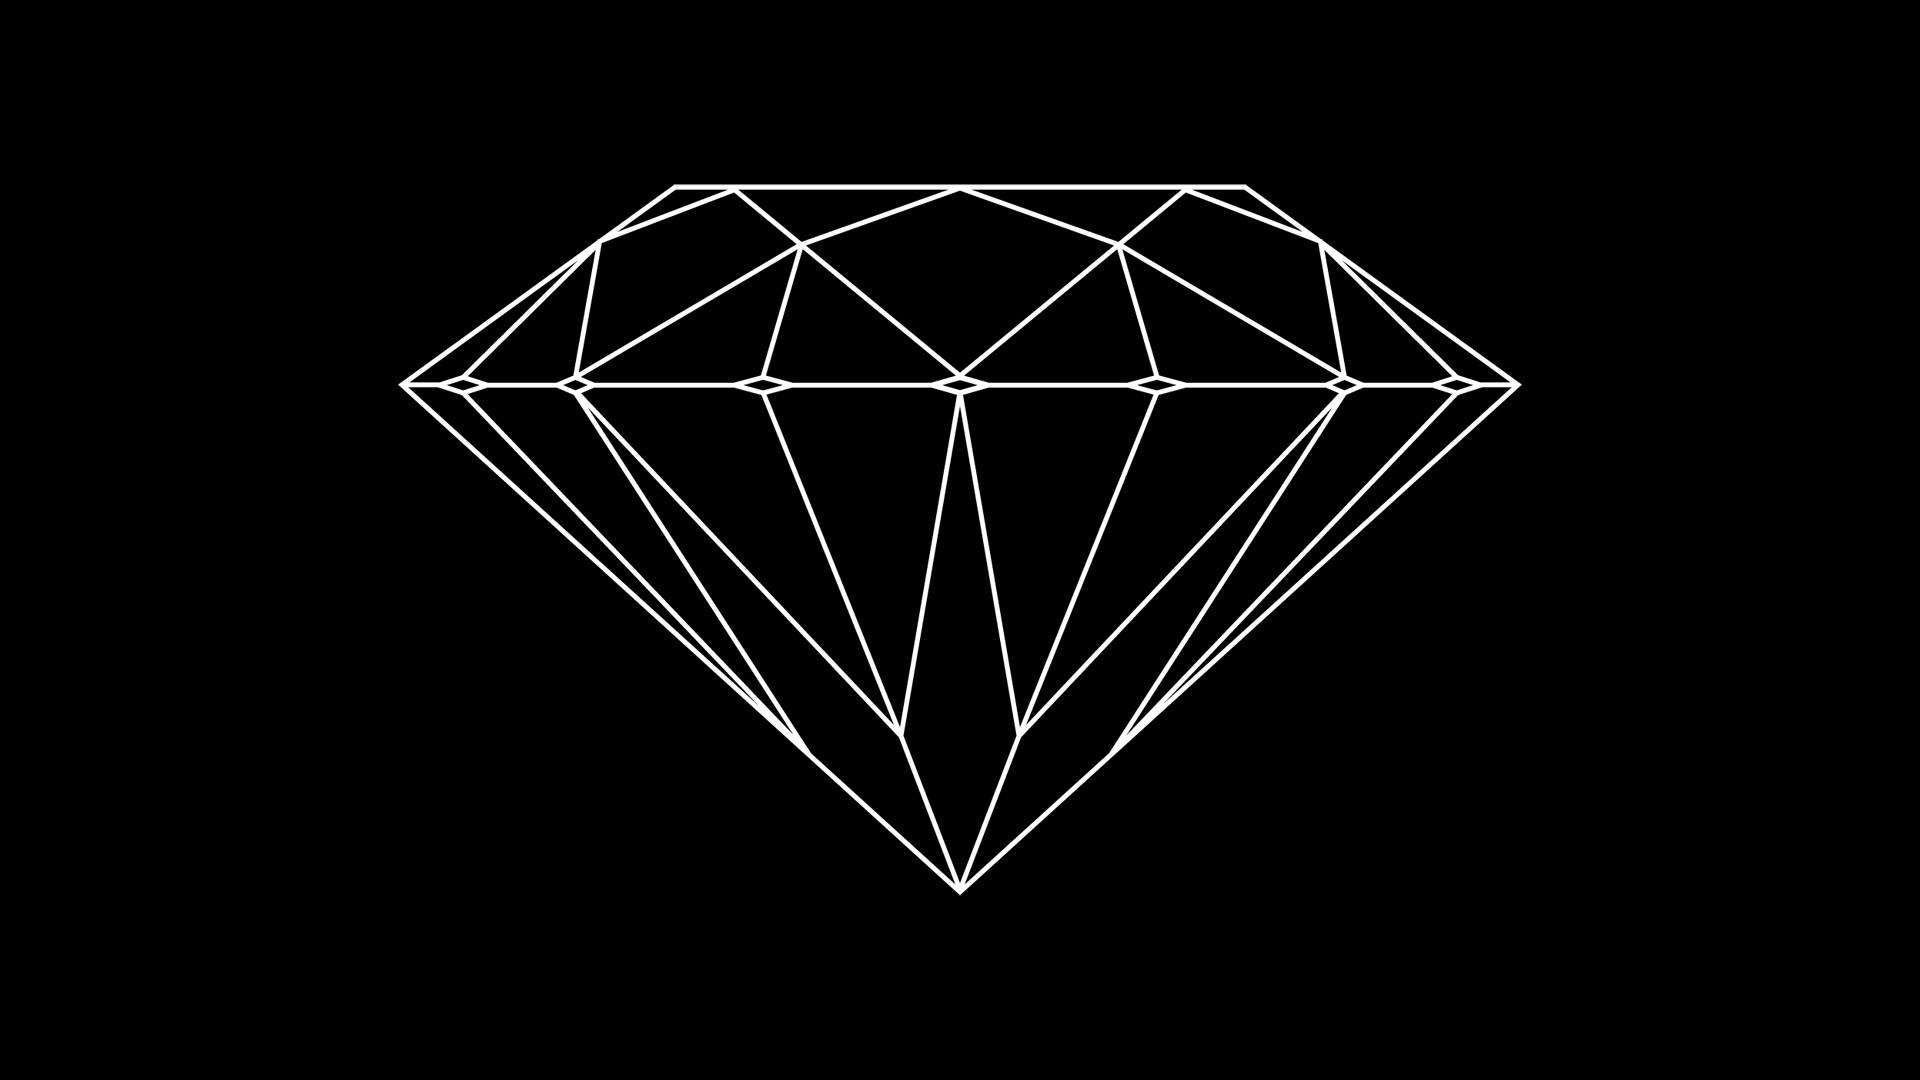 17 Best ideas about Diamond Wallpaper on Pinterest   Black